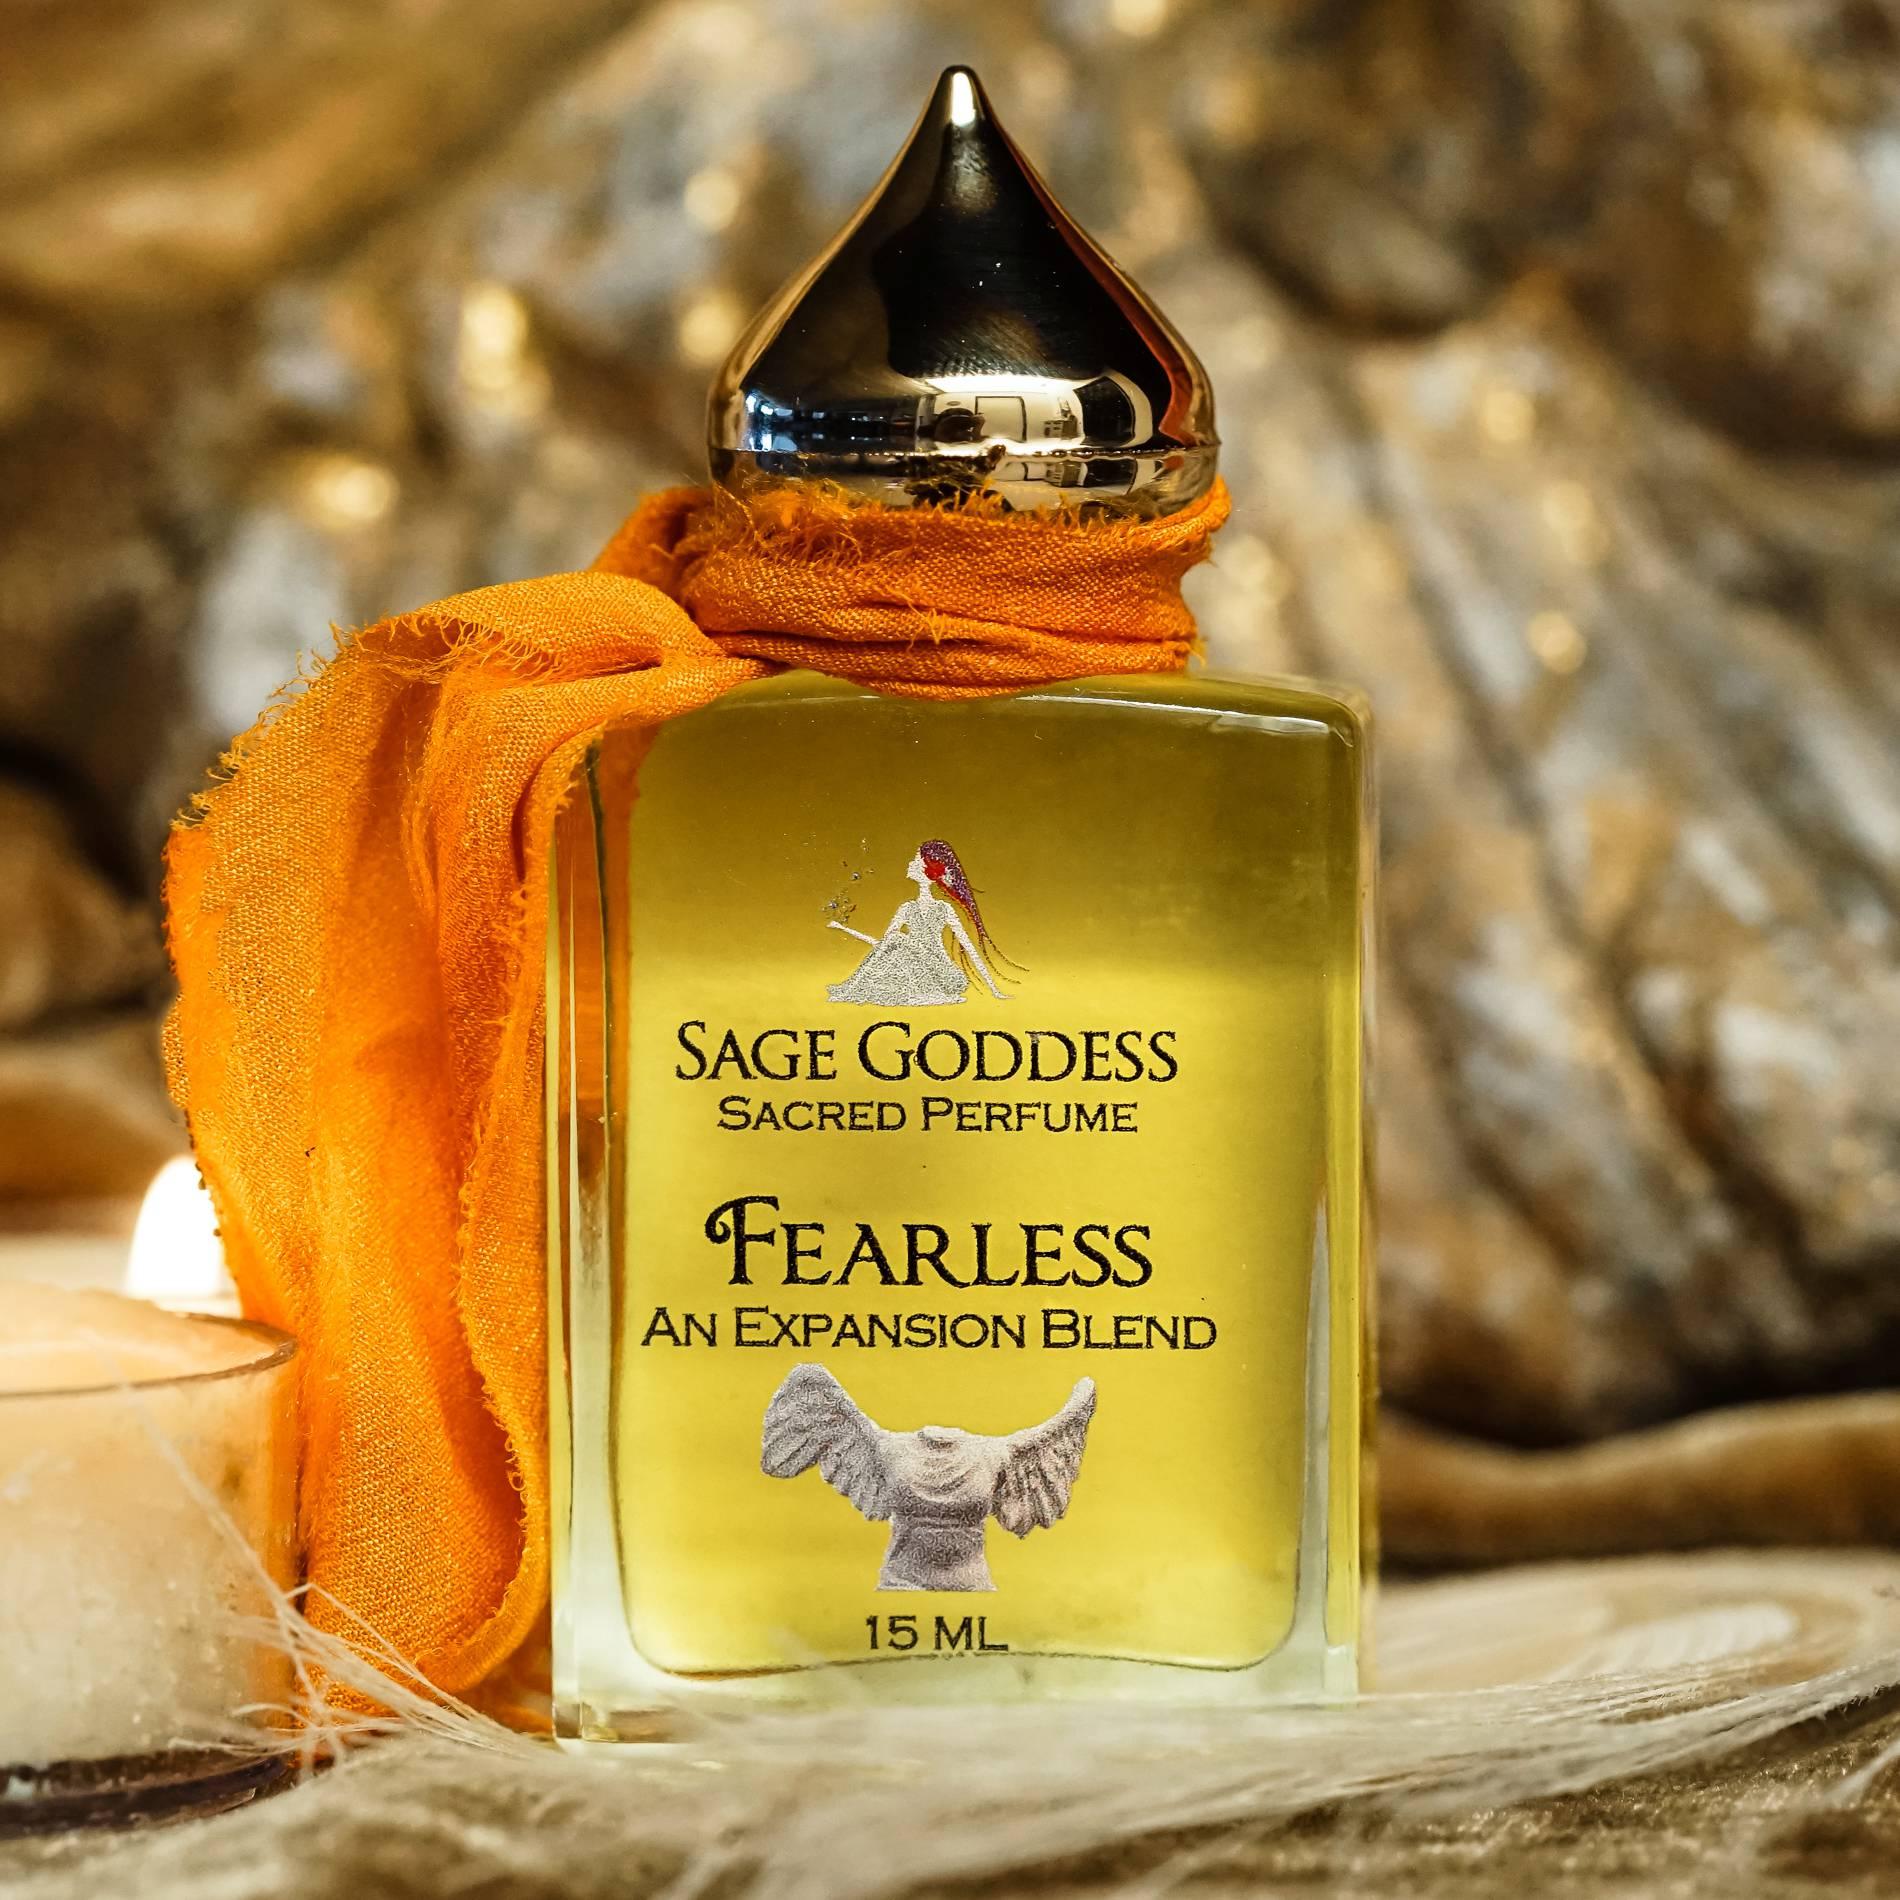 Fearless perfume